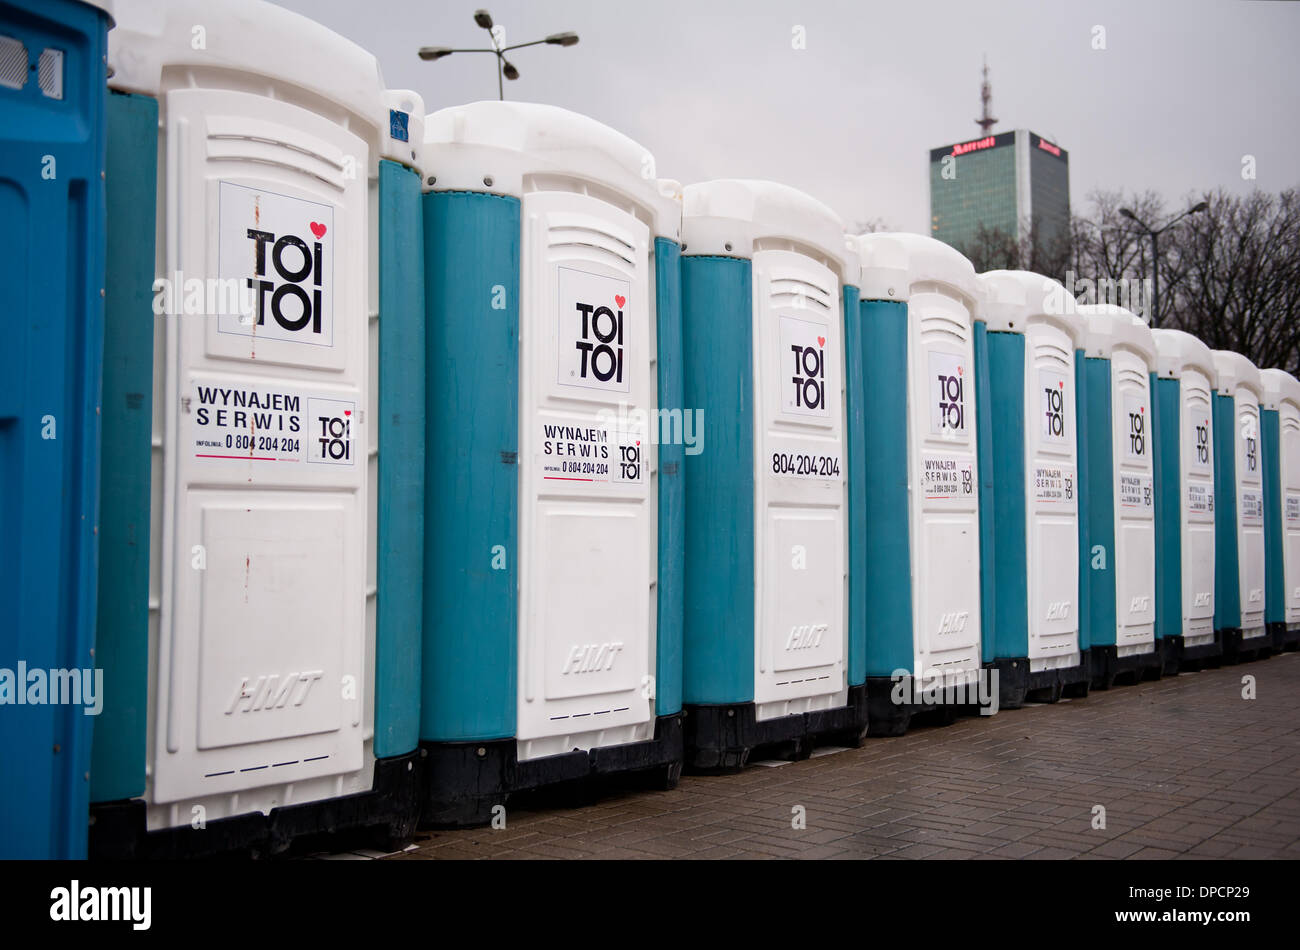 Public Toi Toi Toilet Cabs At Event   Stock Image